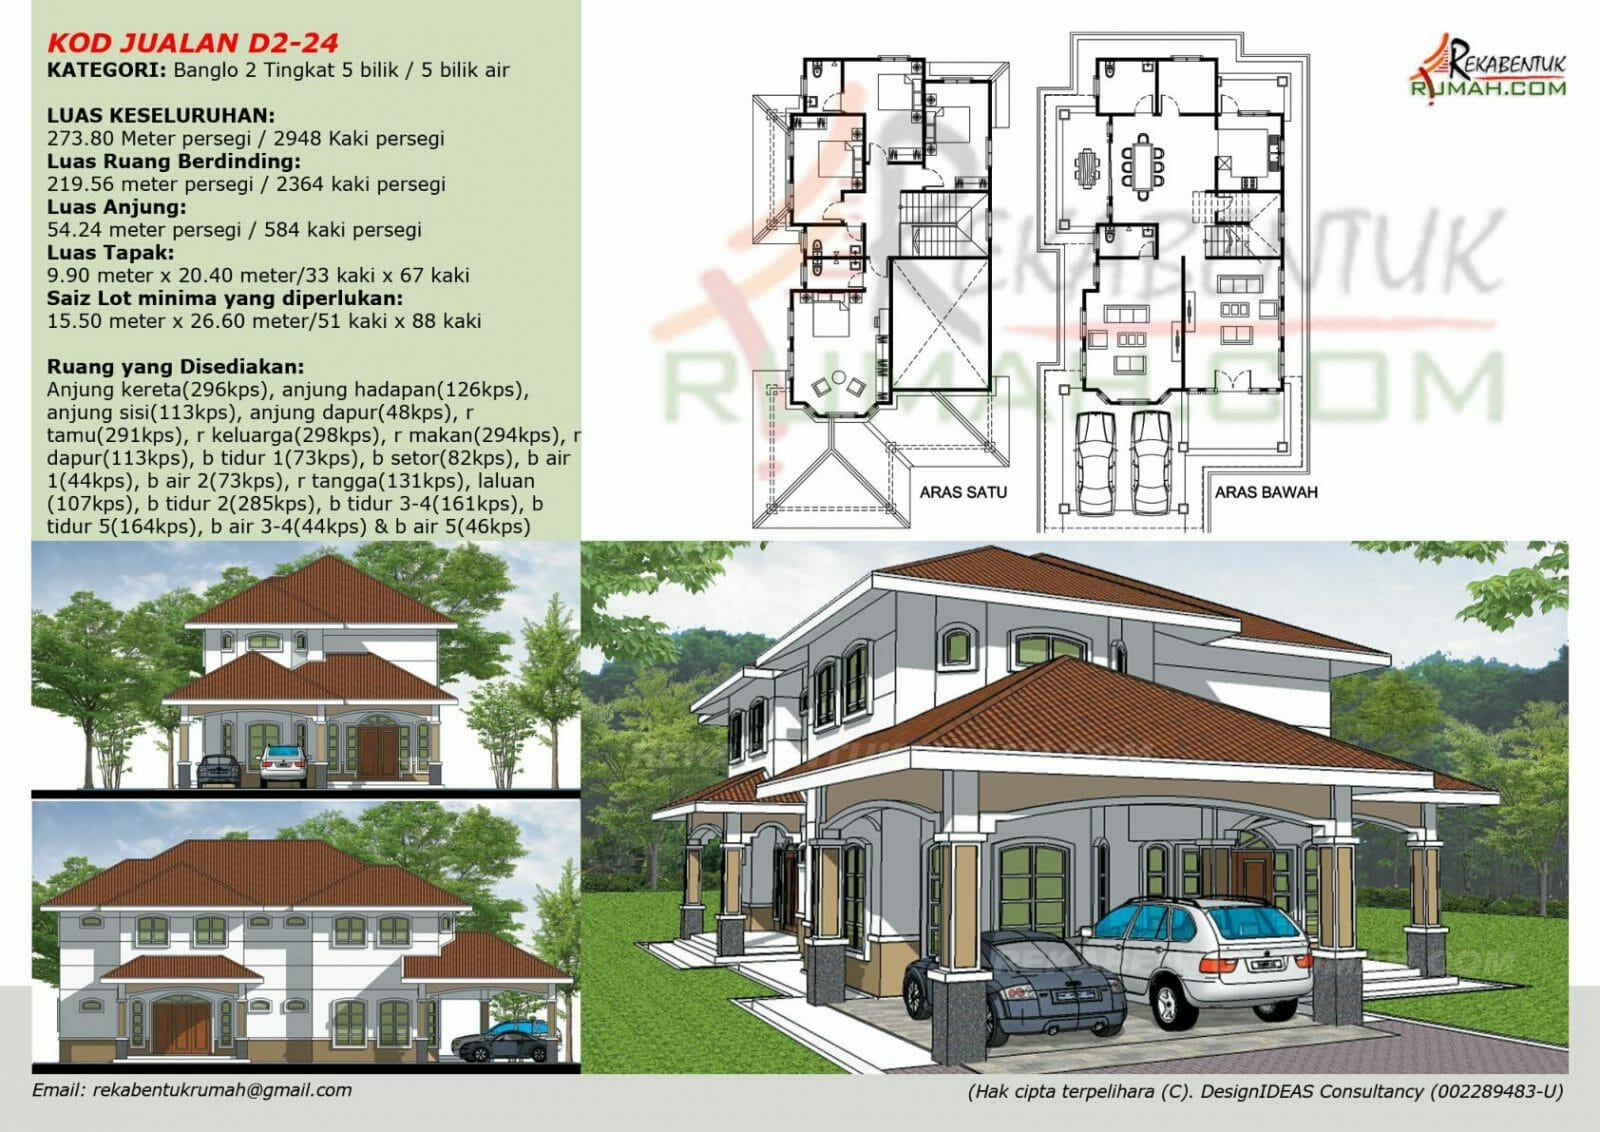 Home Grid 7